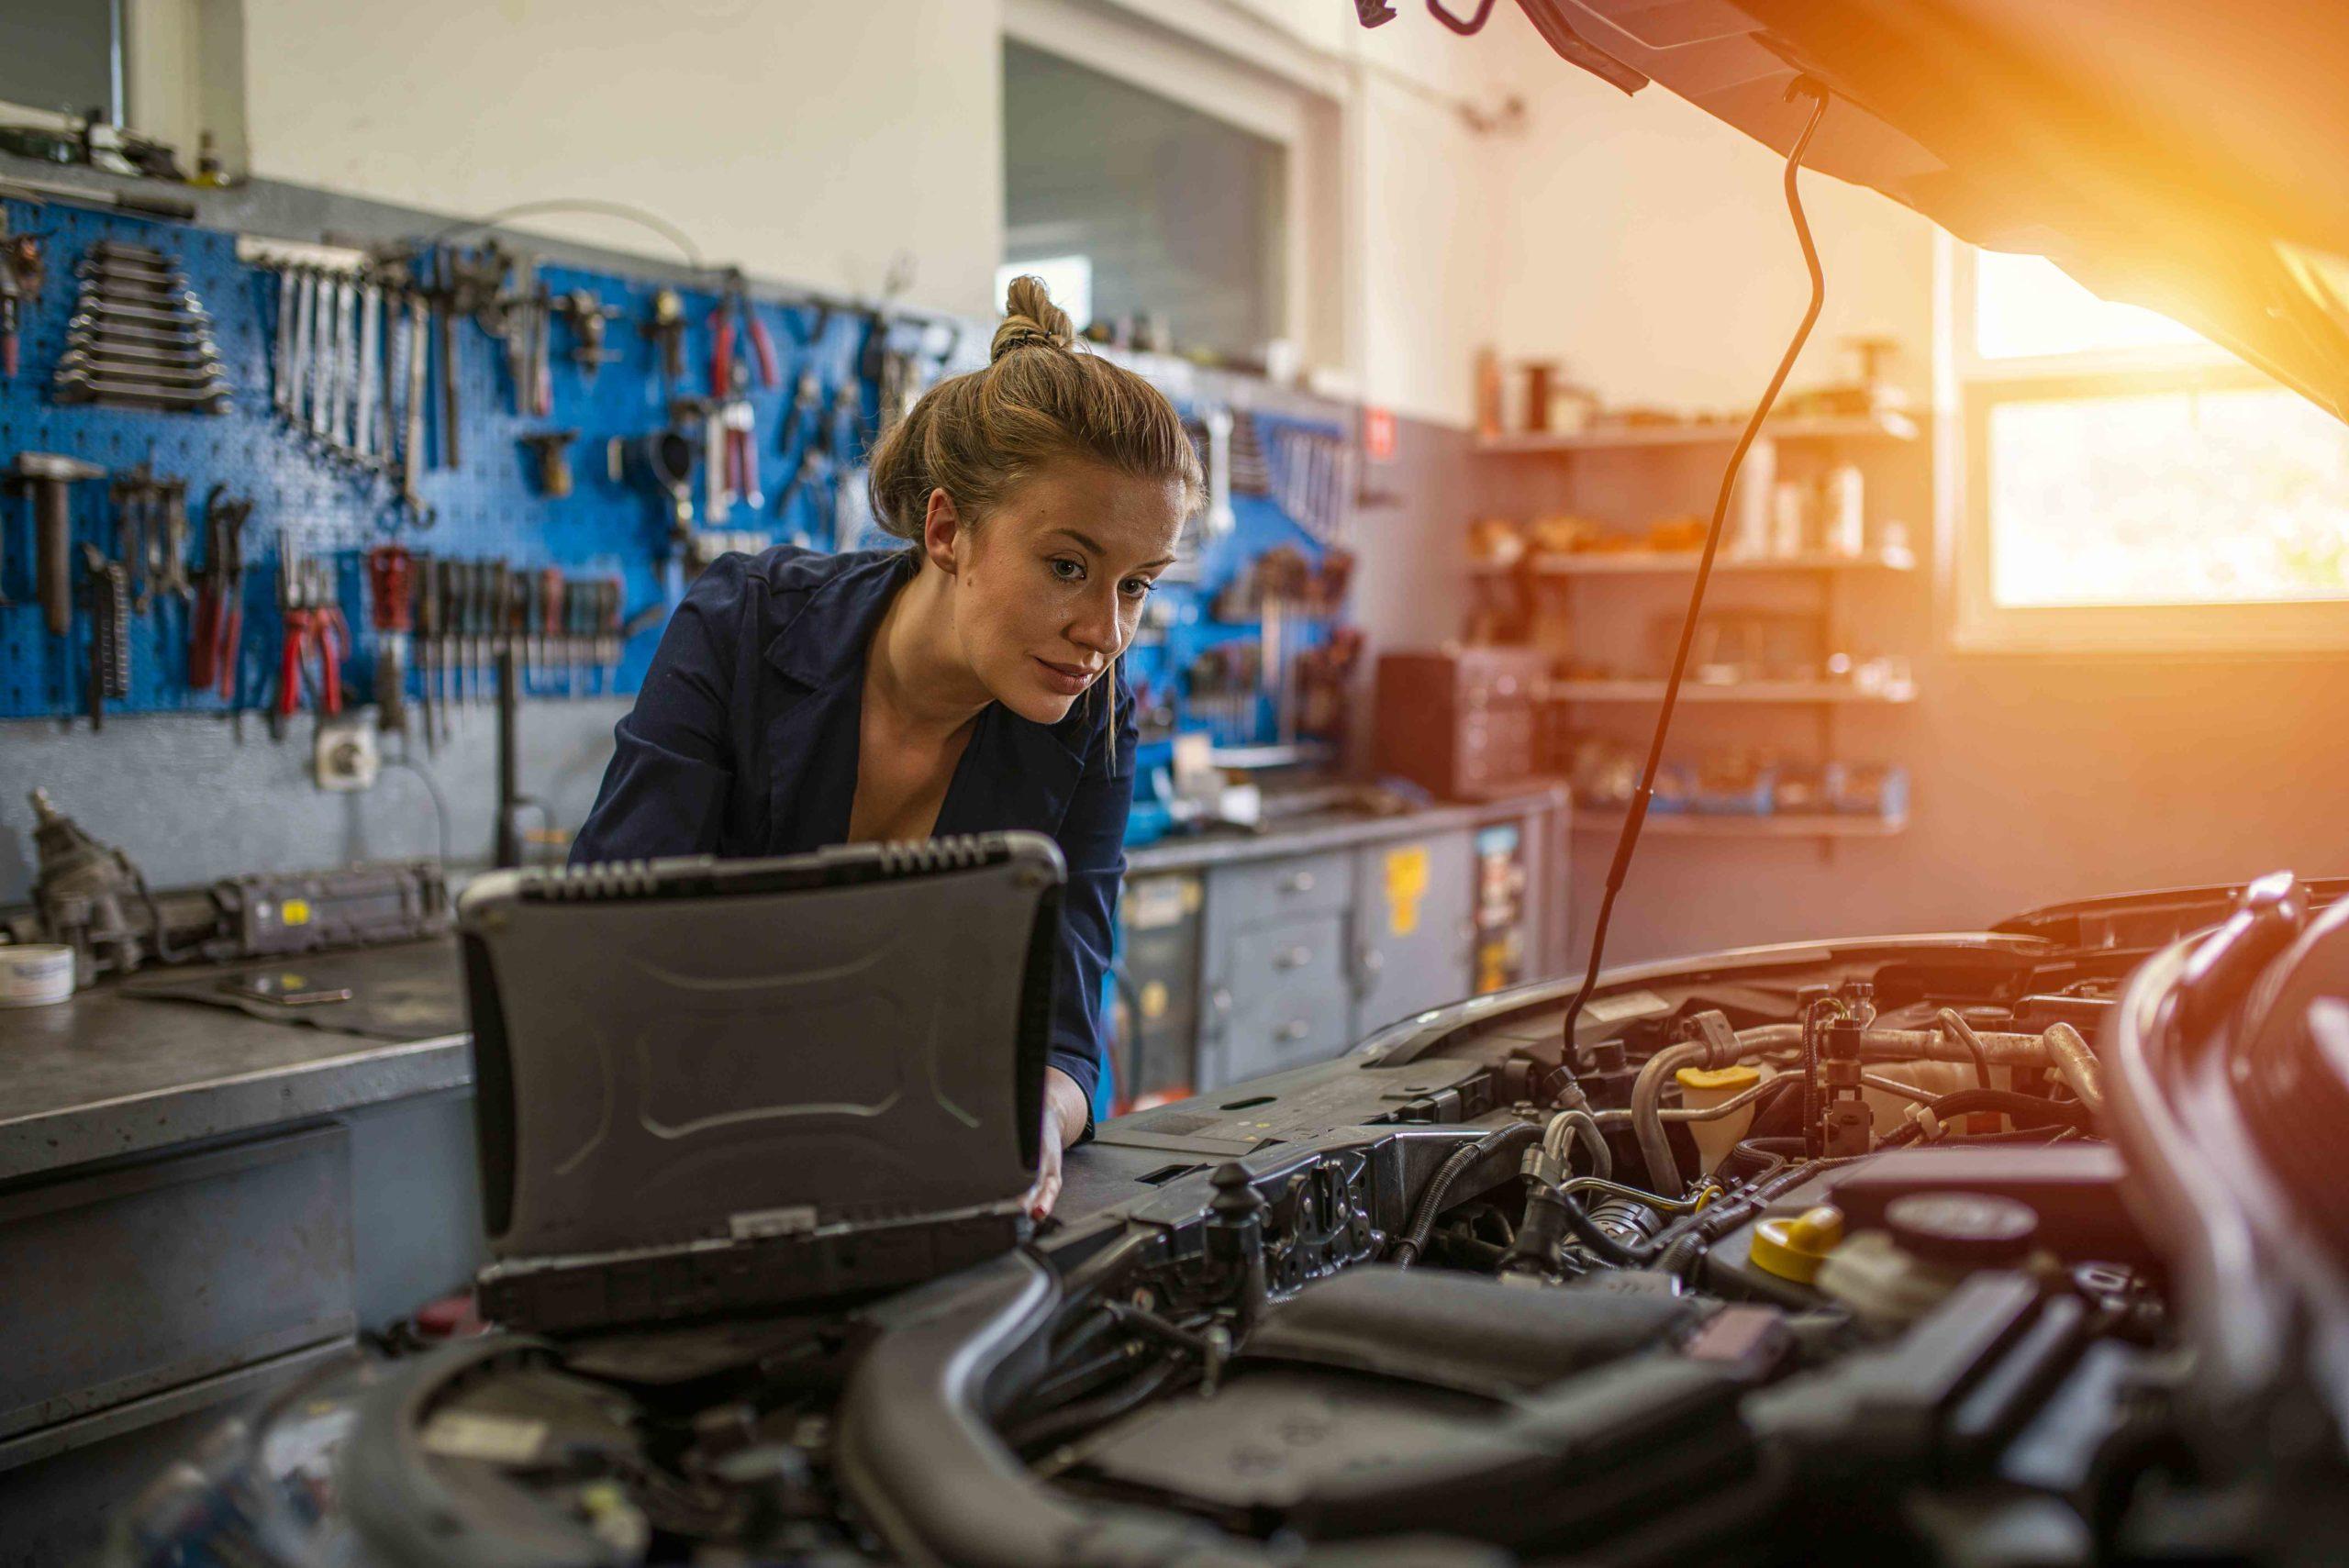 auto repair technician working on laptop in garahe